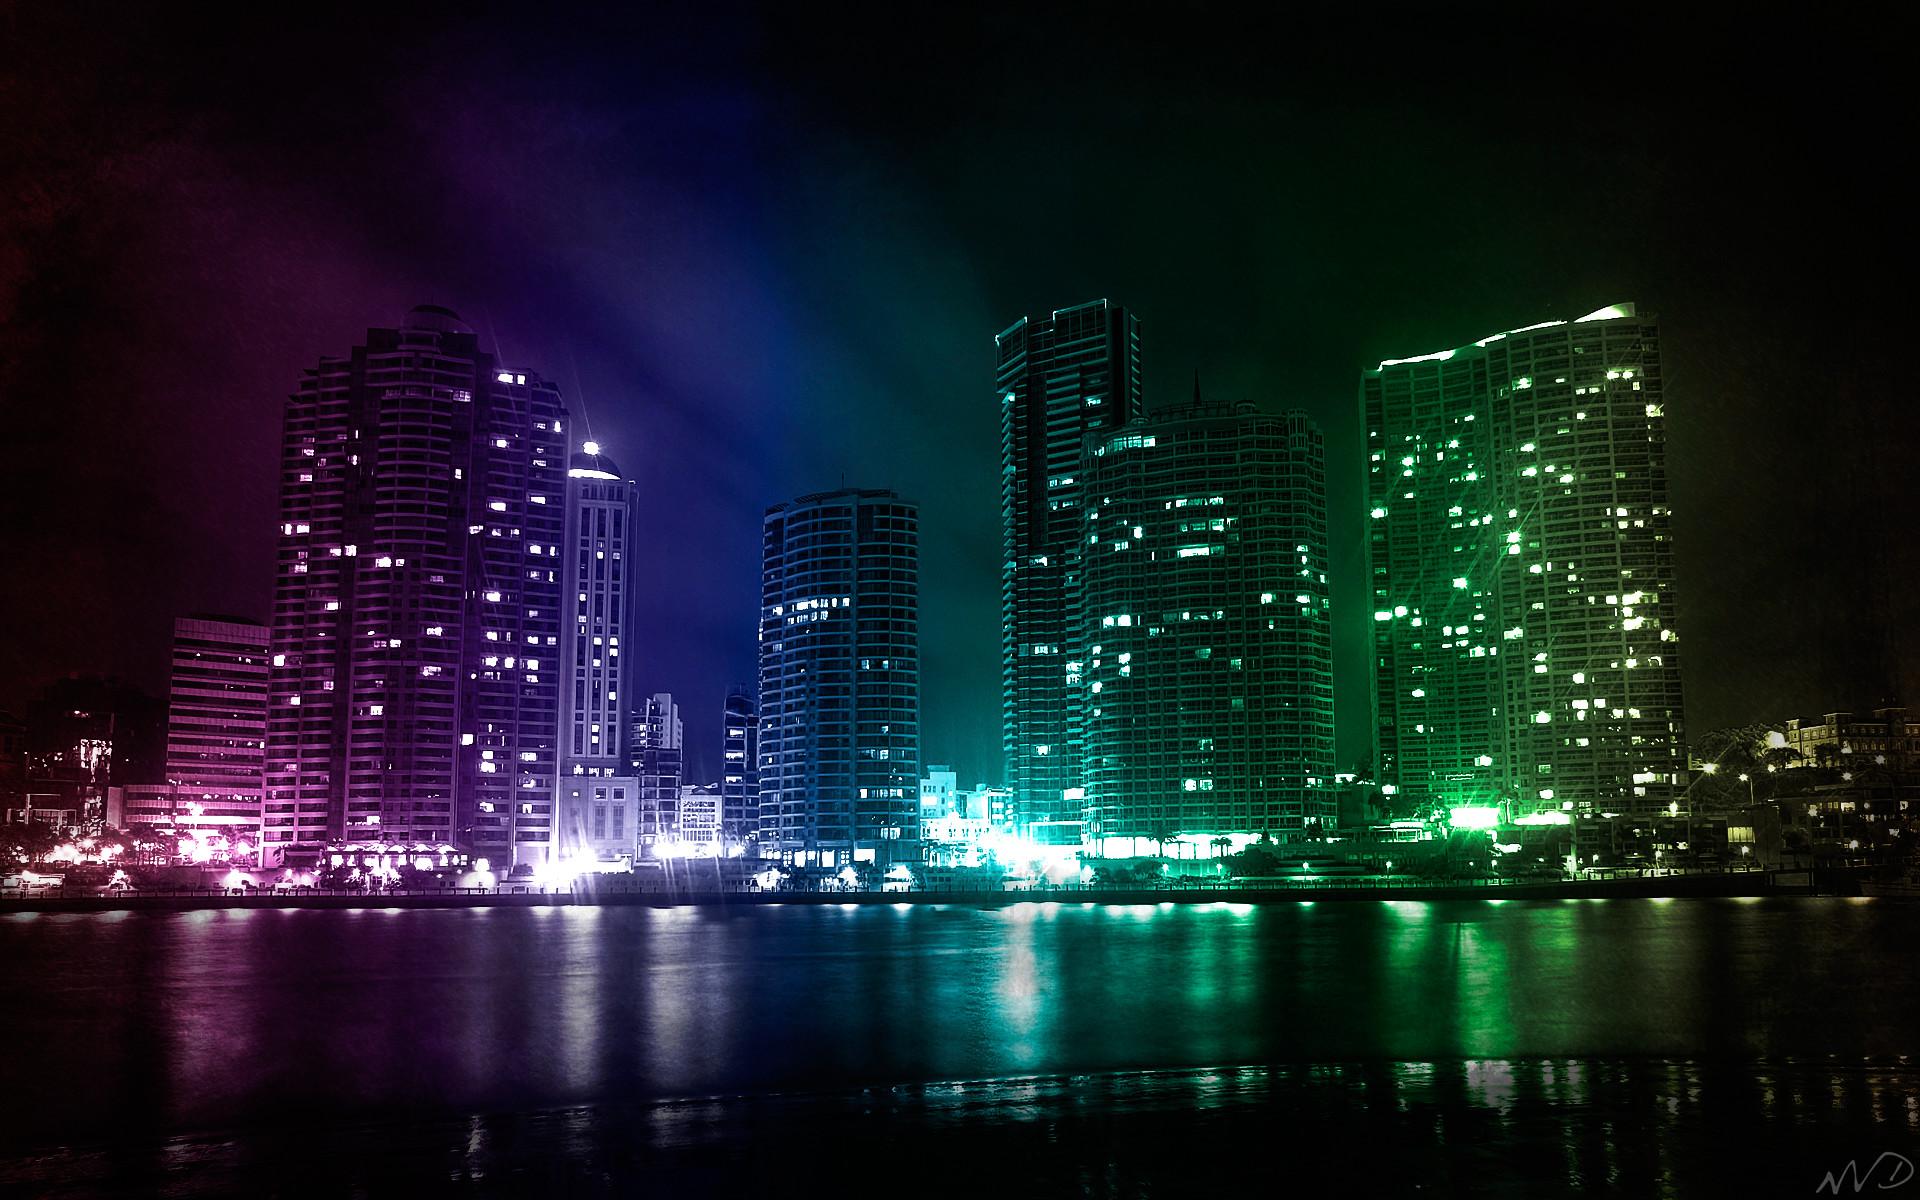 … city wallpaper 3 …